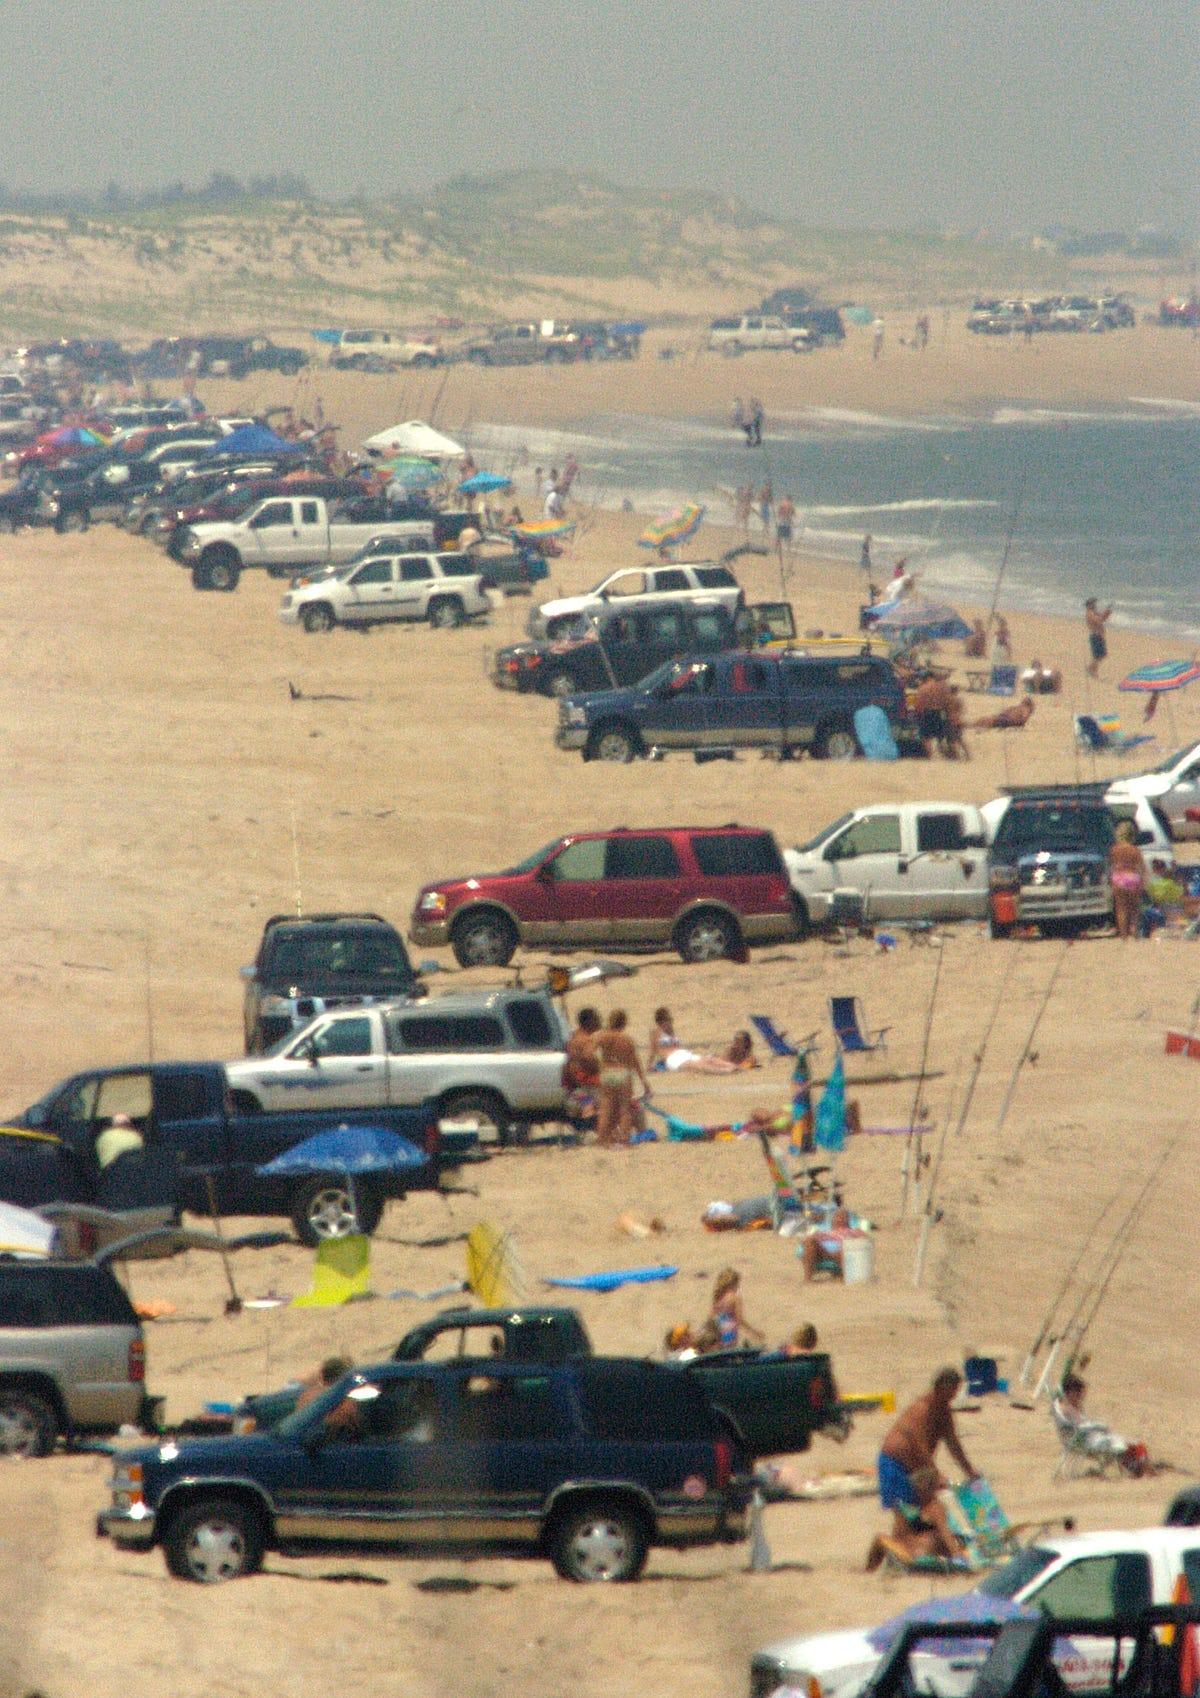 10 prime fishing holes at Delaware Beaches